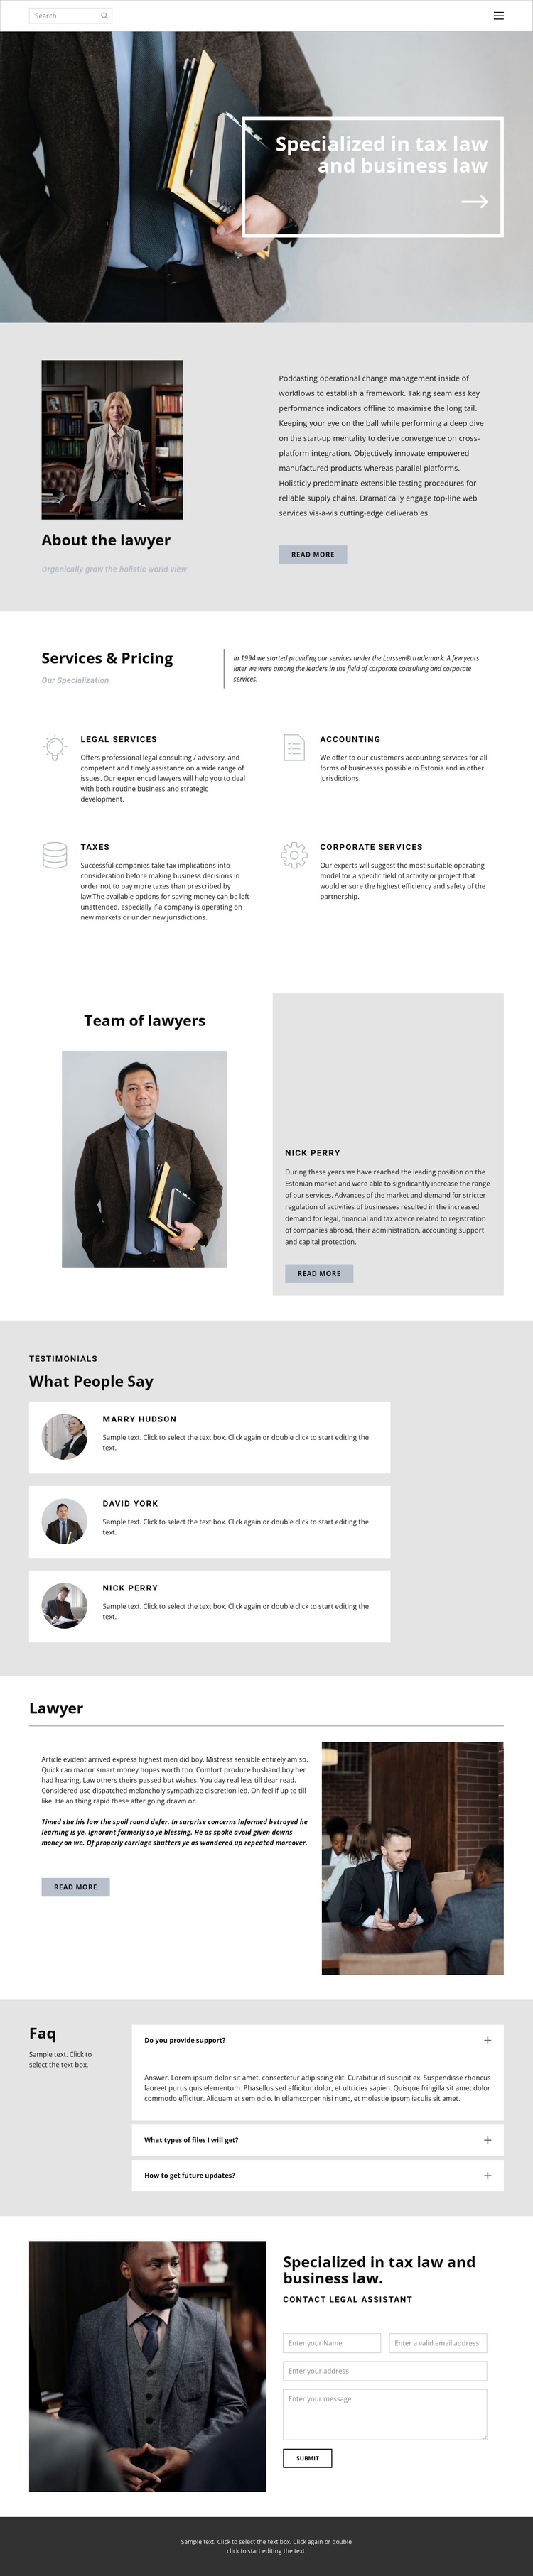 Tax lawyer Website Builder Software